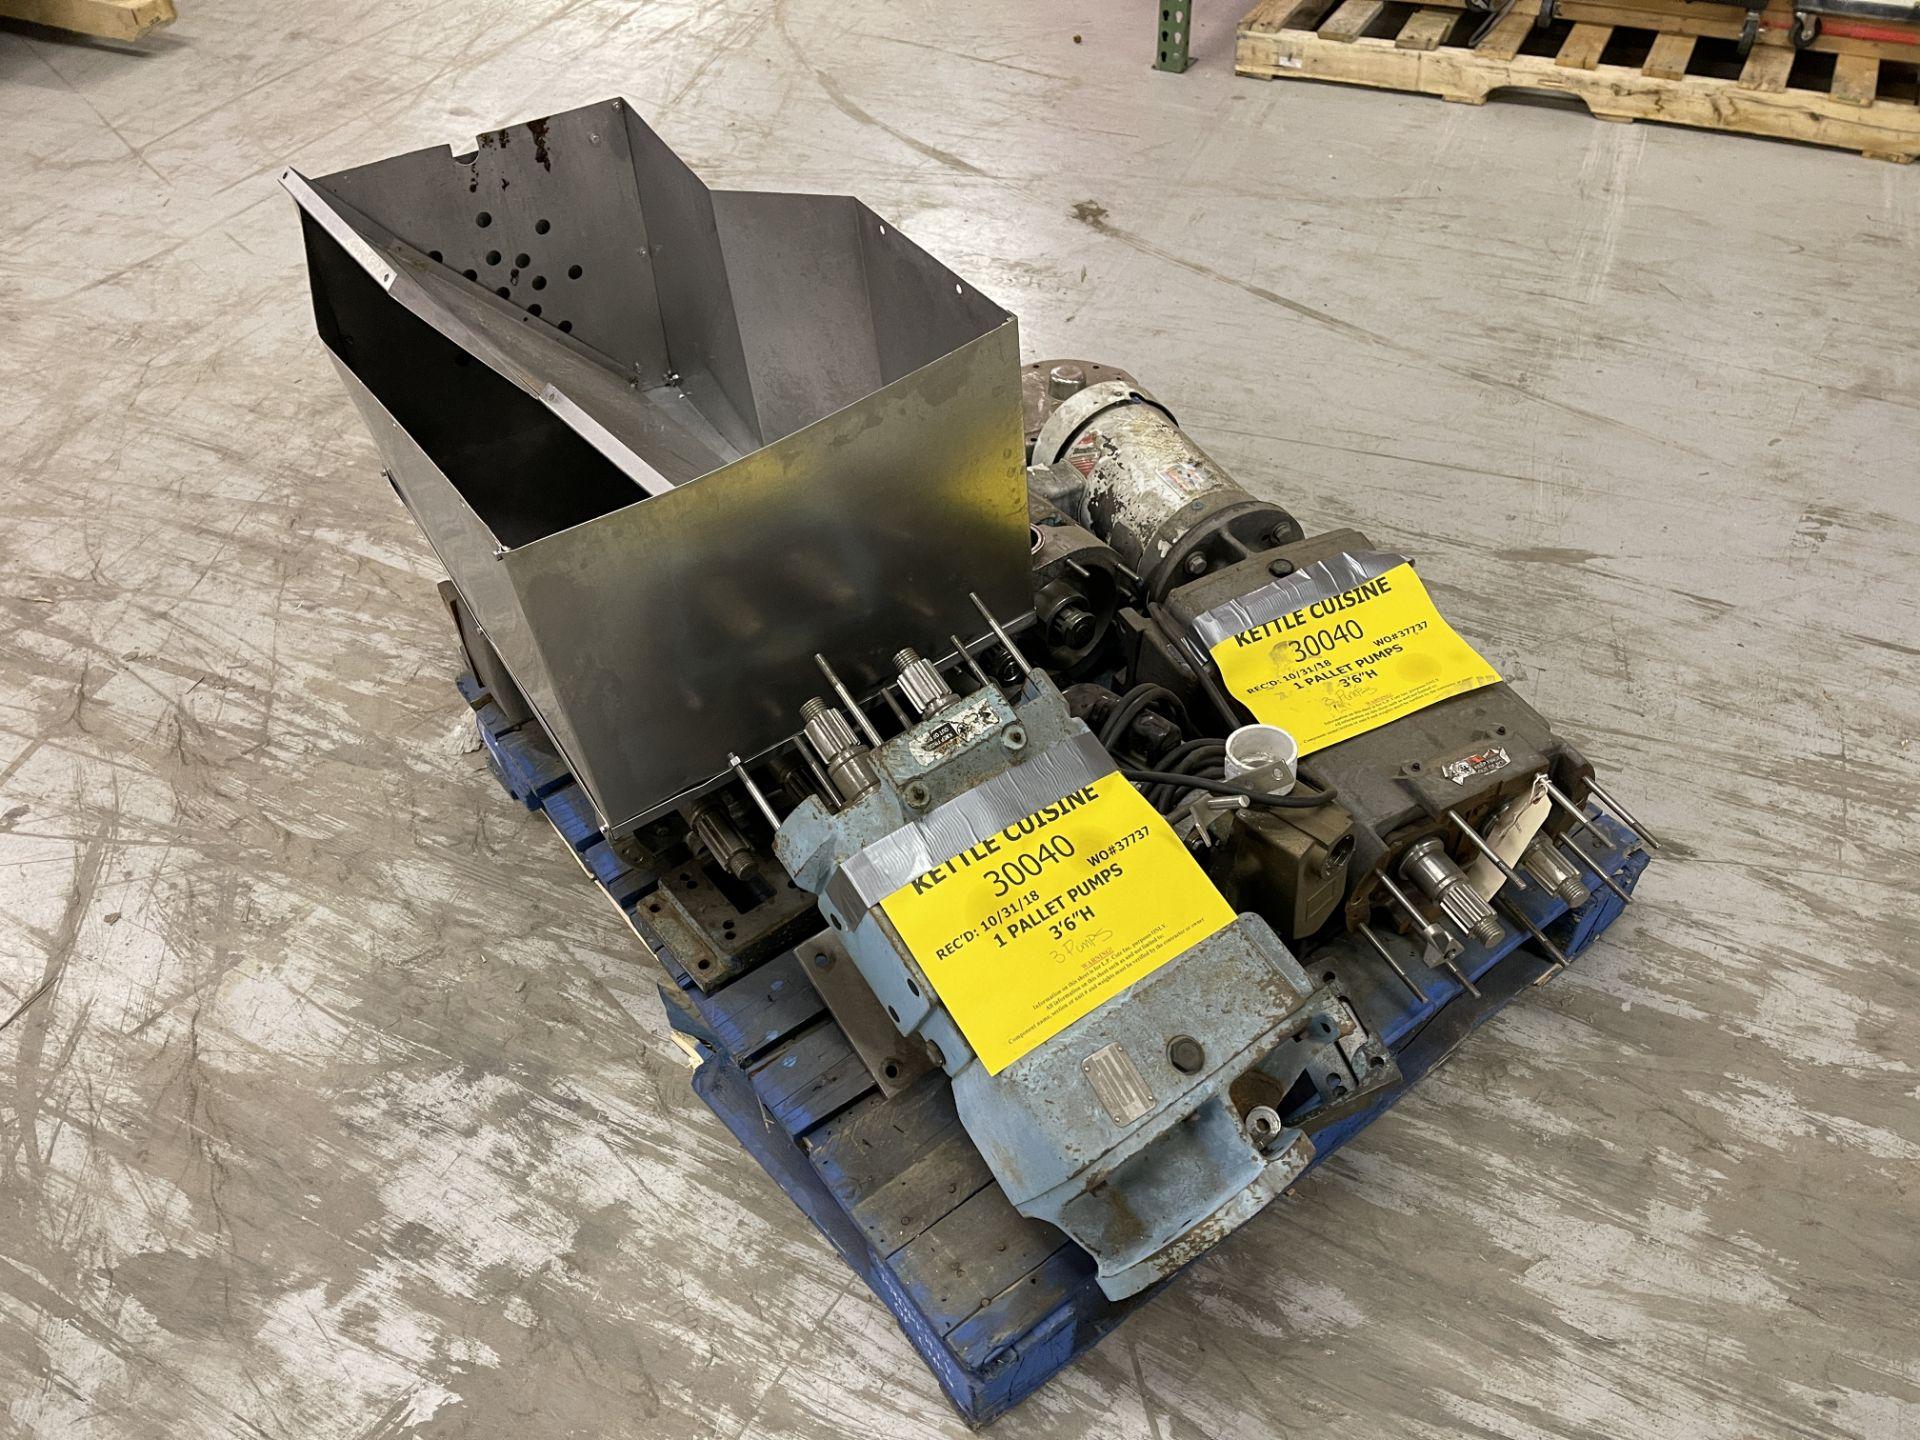 Misc Pump Parts - Image 2 of 3